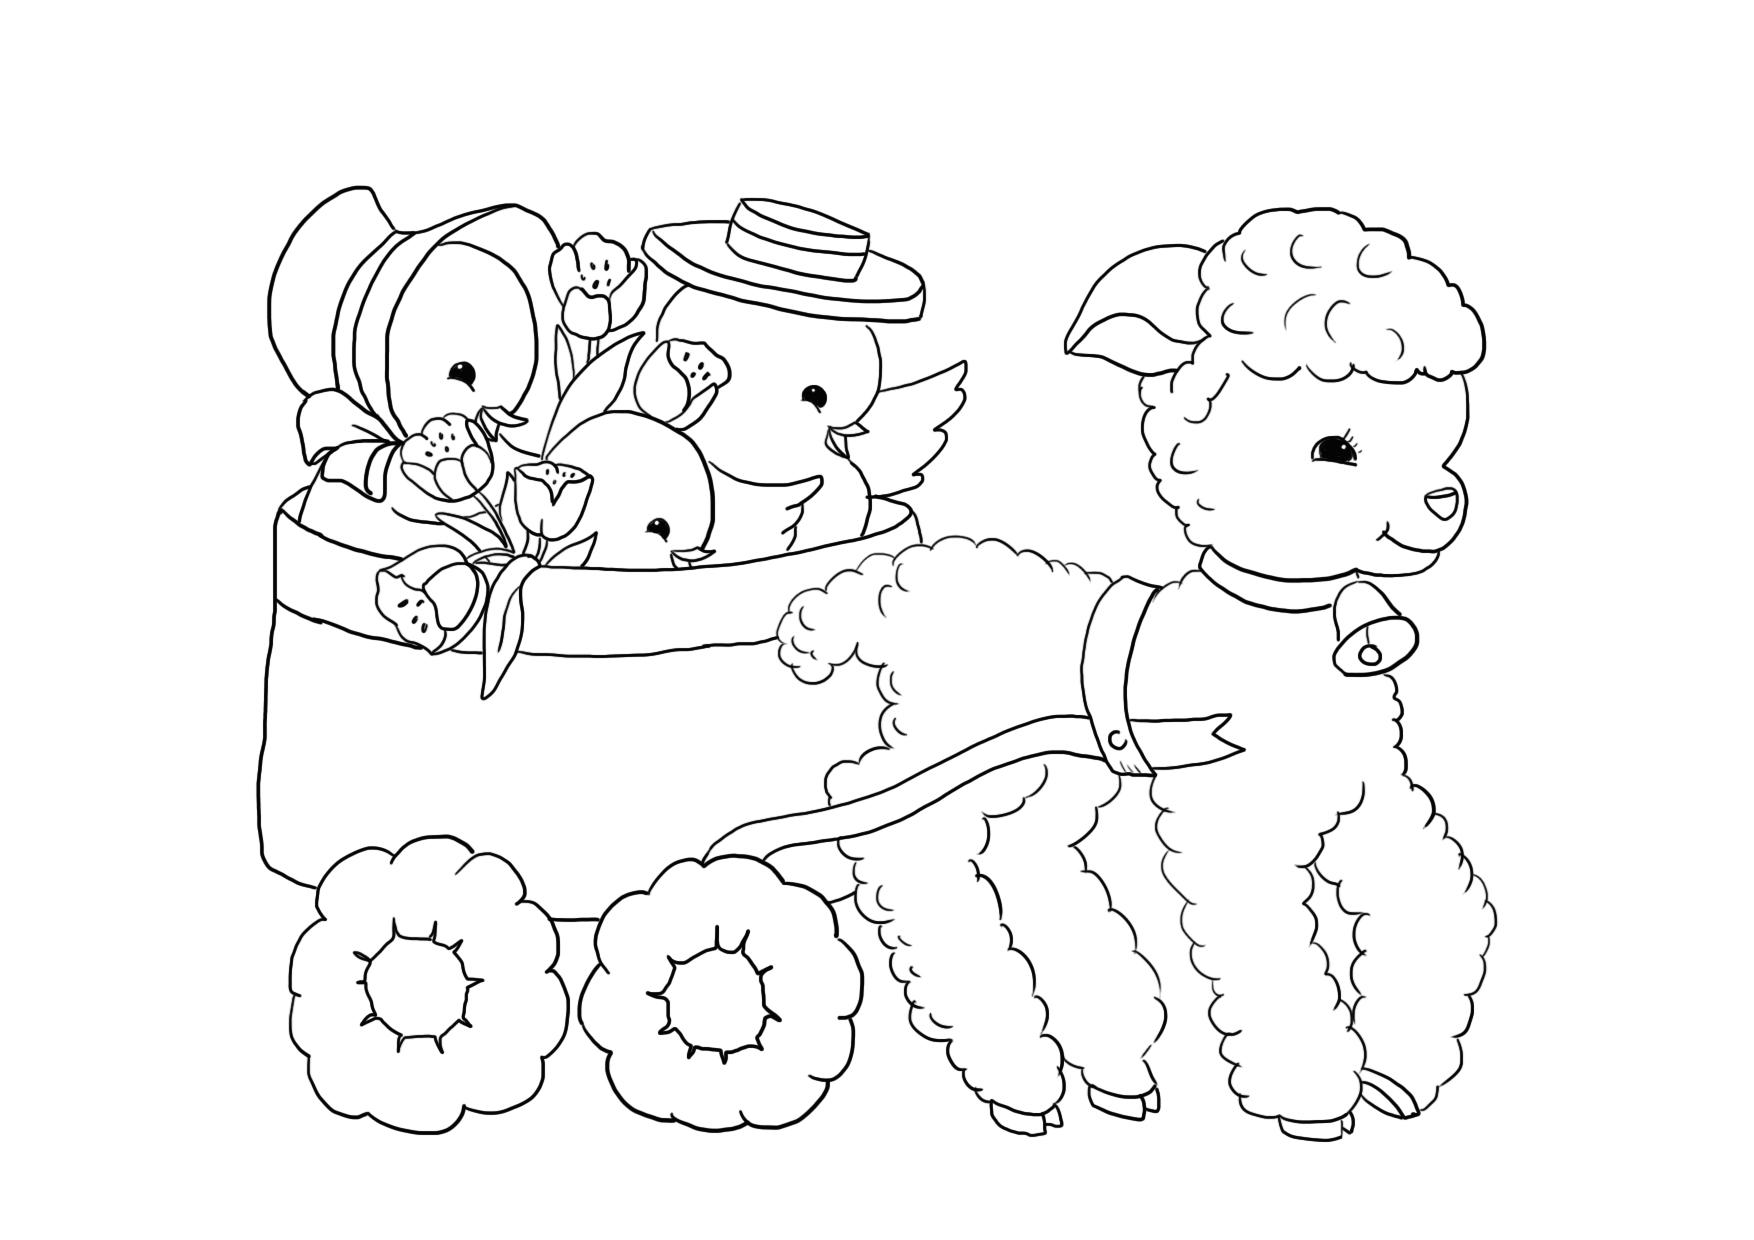 lamb coloring page free coloring pages download xsibe sheep